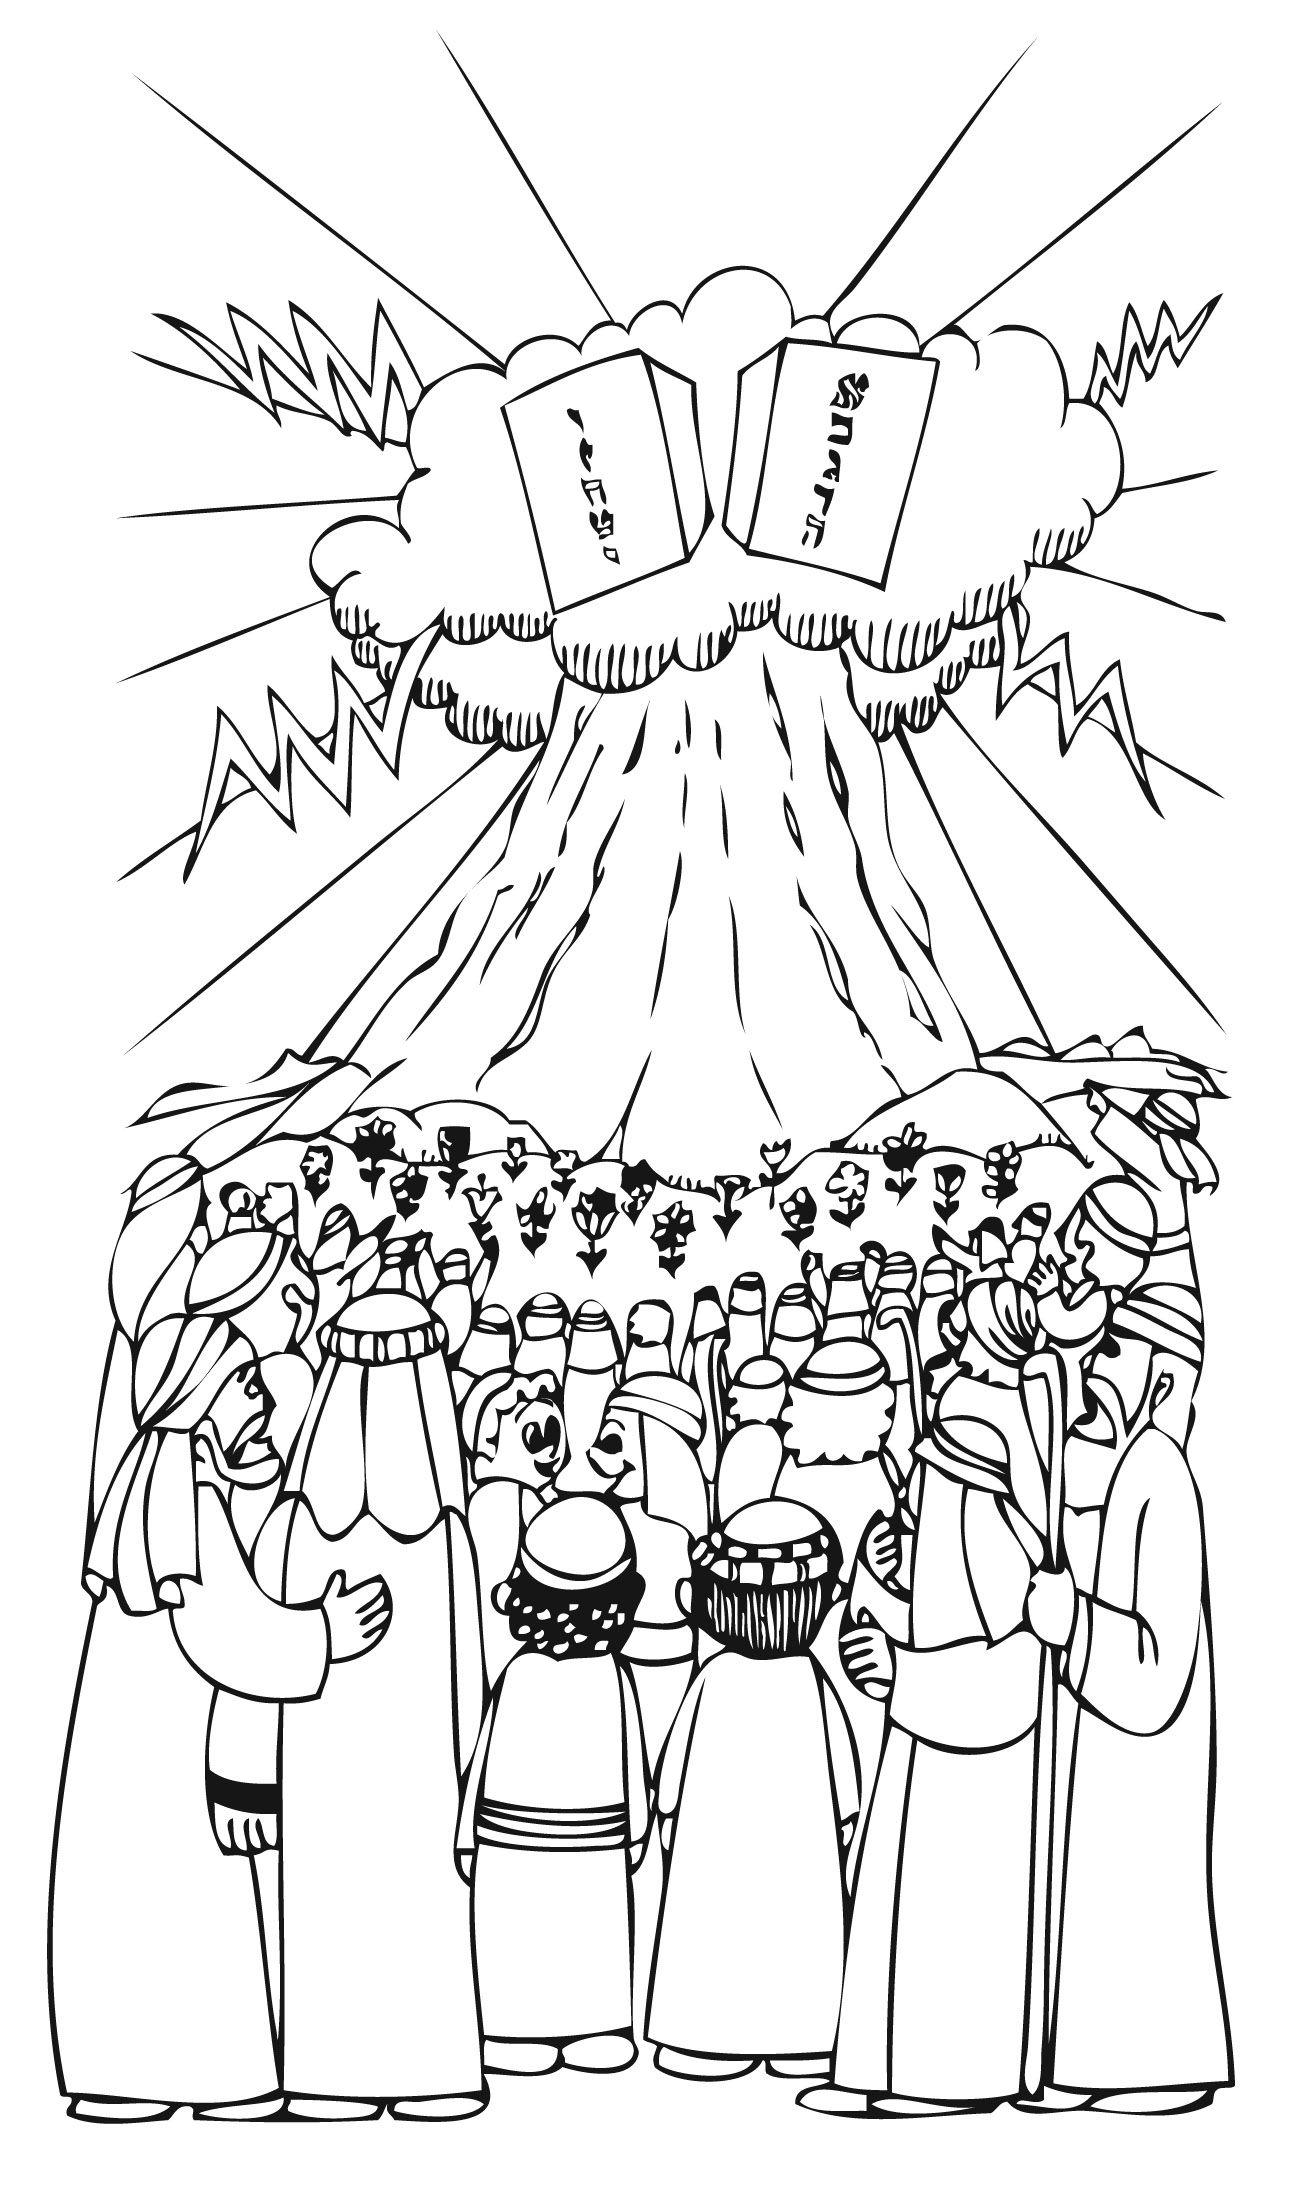 Coloring Sheet The Jews Standing Around Mount Sinai As